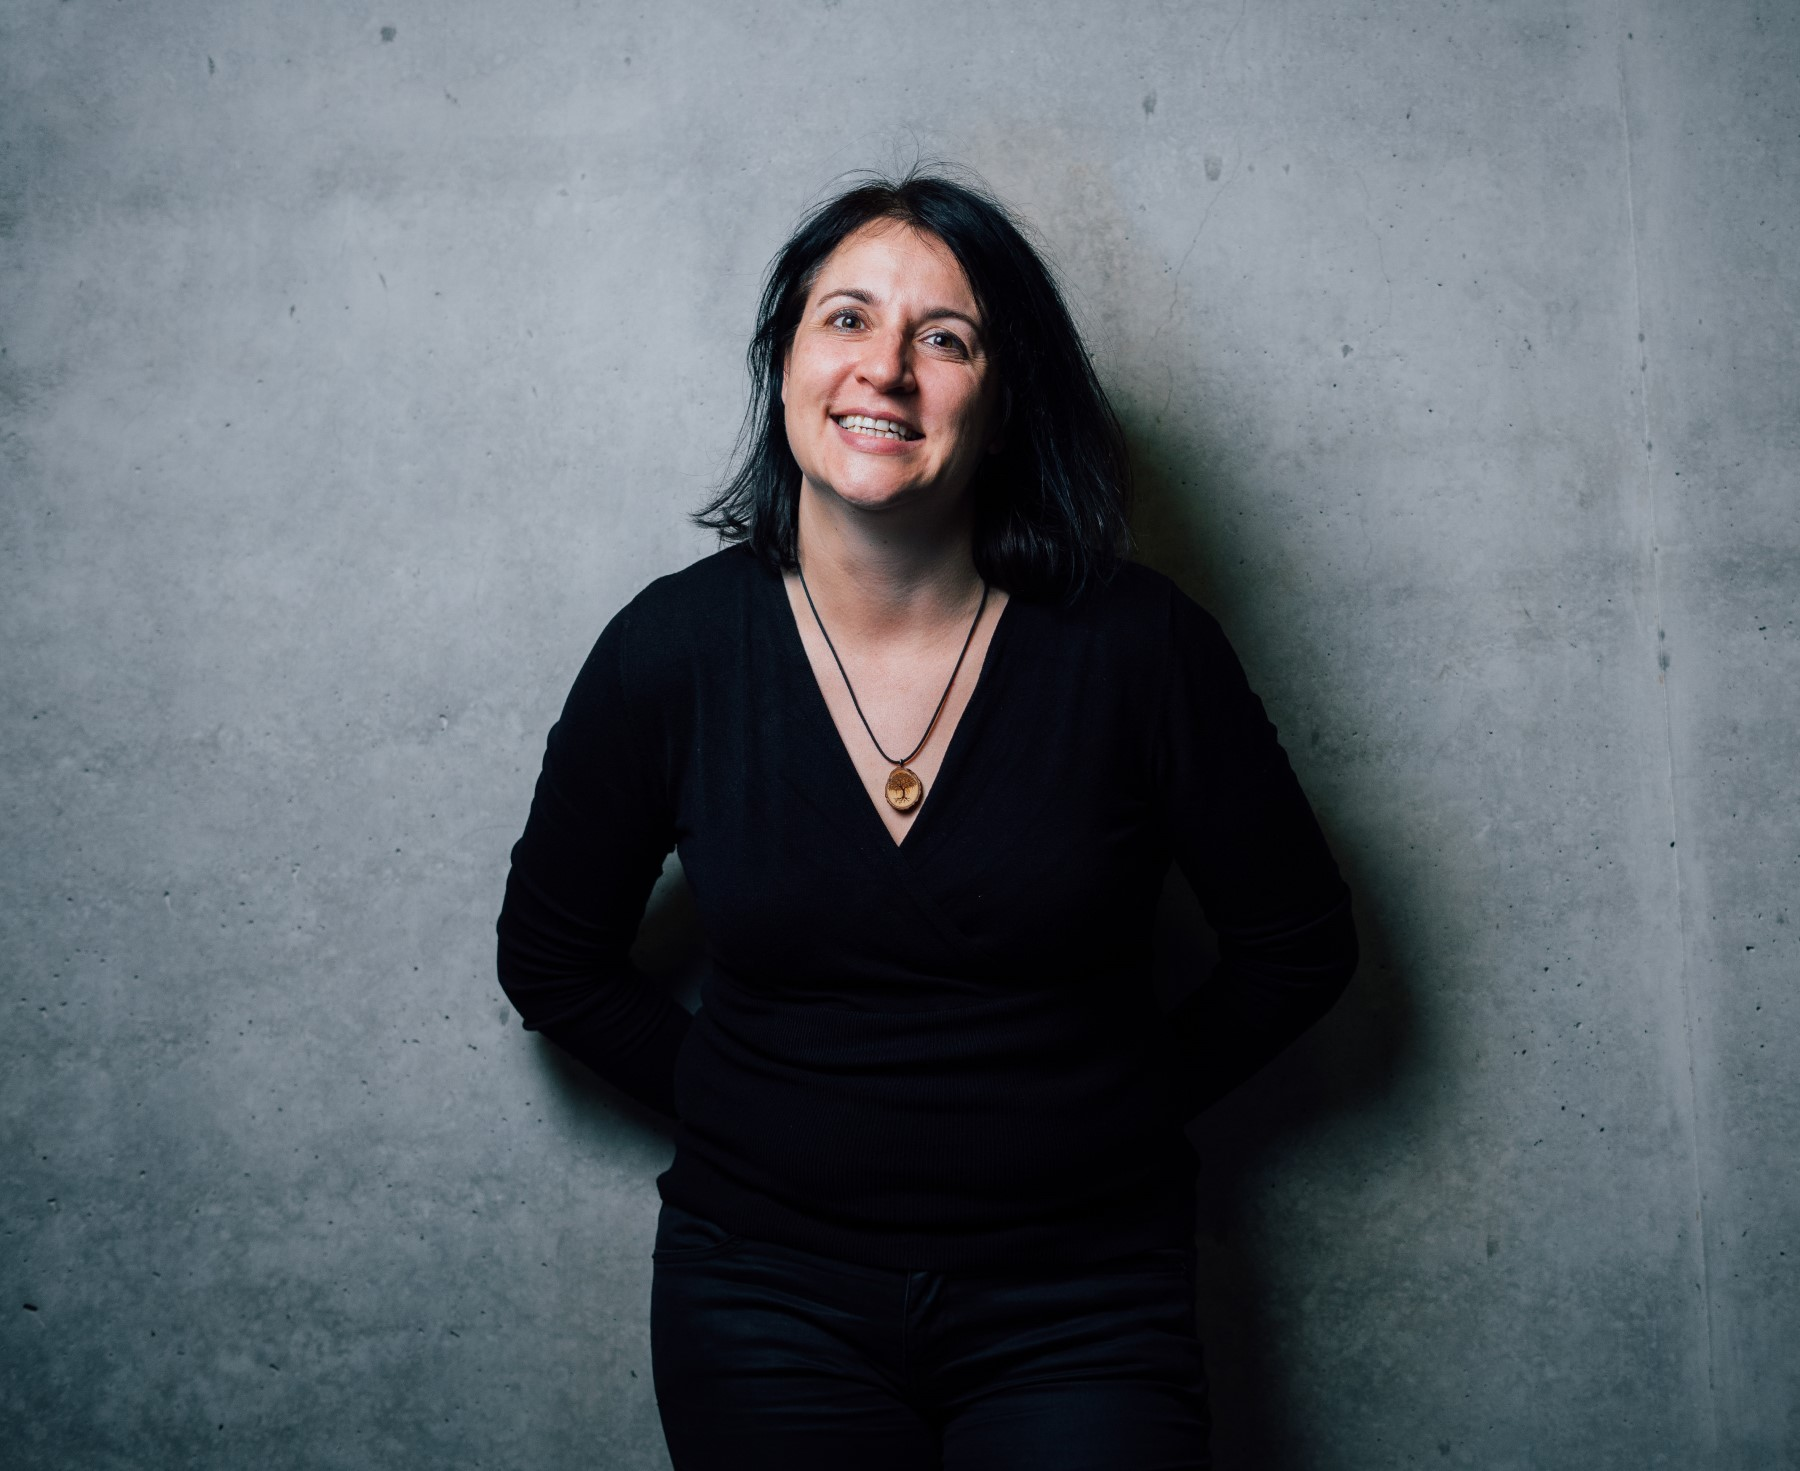 Susanne Kailitz